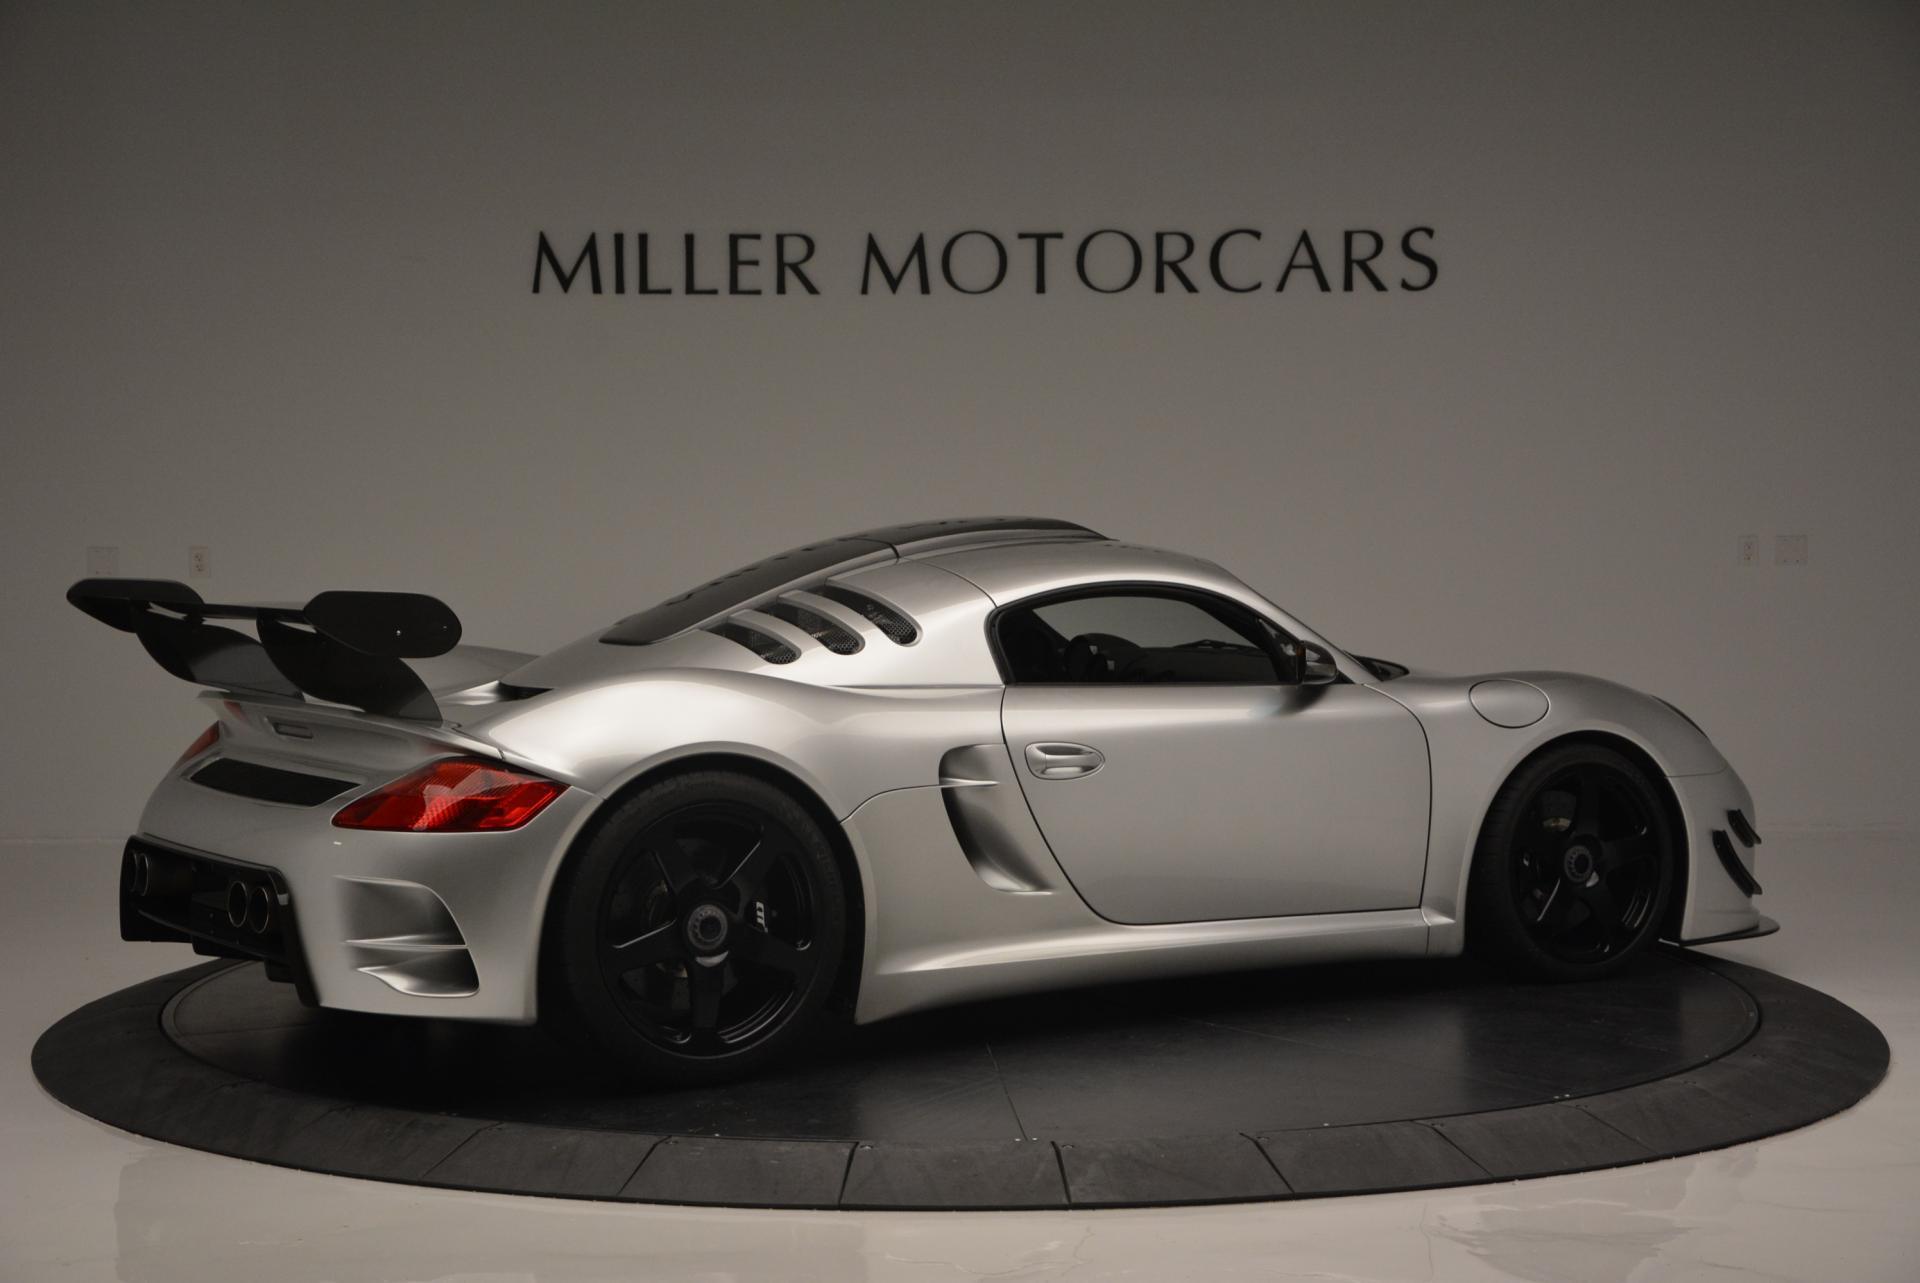 Used 2012 Porsche RUF CTR-3 Clubsport For Sale In Westport, CT 110_p10